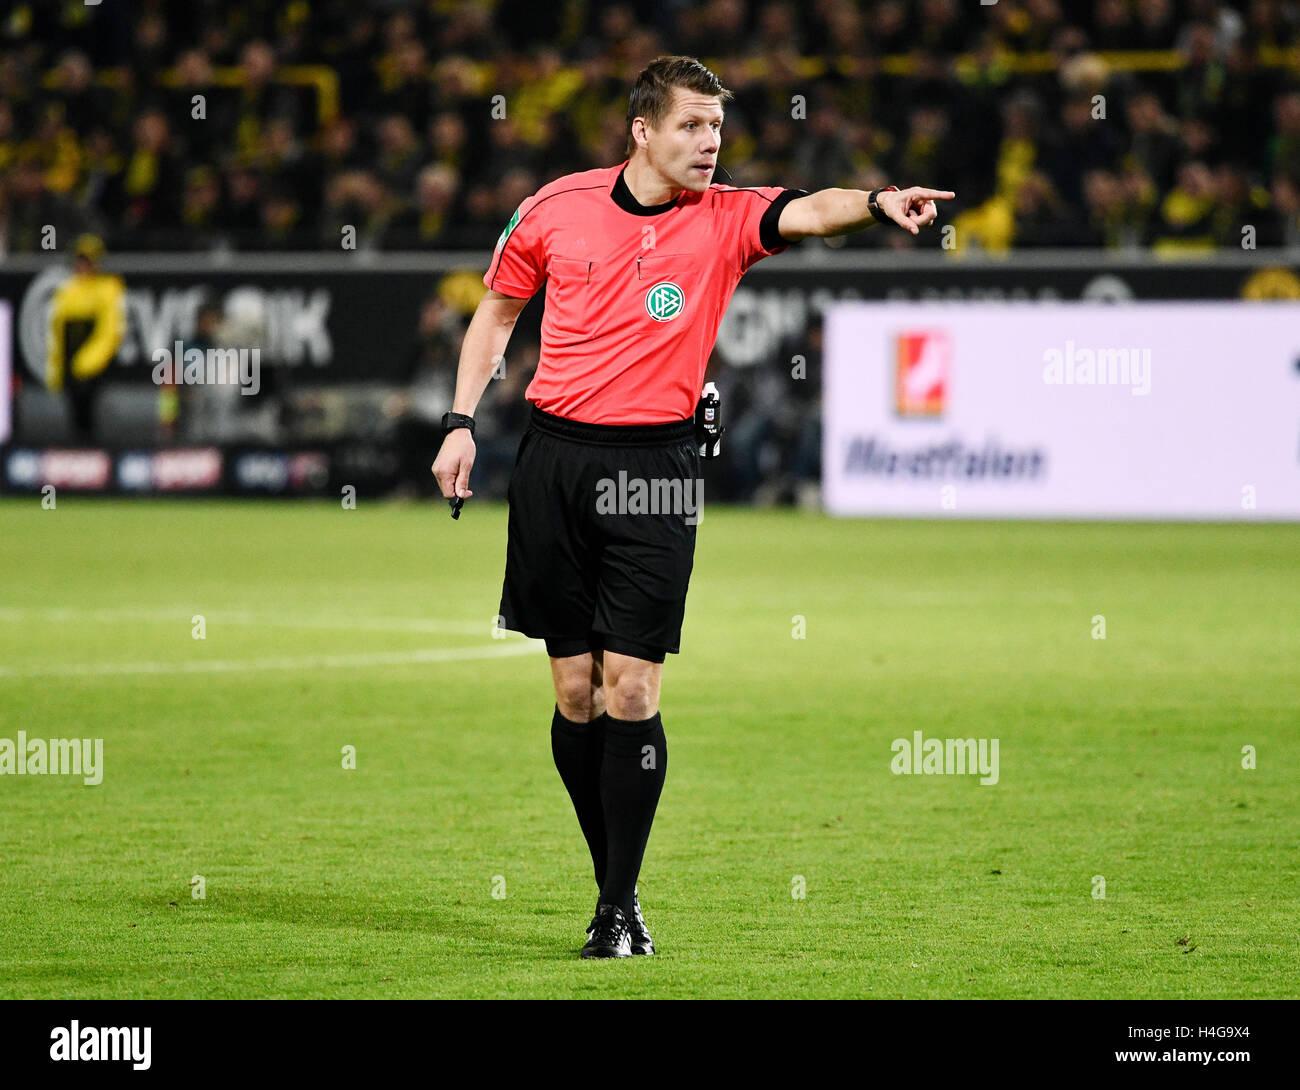 Signal-Iduna Arena Dortmund, Germany 14.10.2016, 1st Football Bundesliga Season 2016/2017 matchday 7, Borussia Dortmund - Stock Image